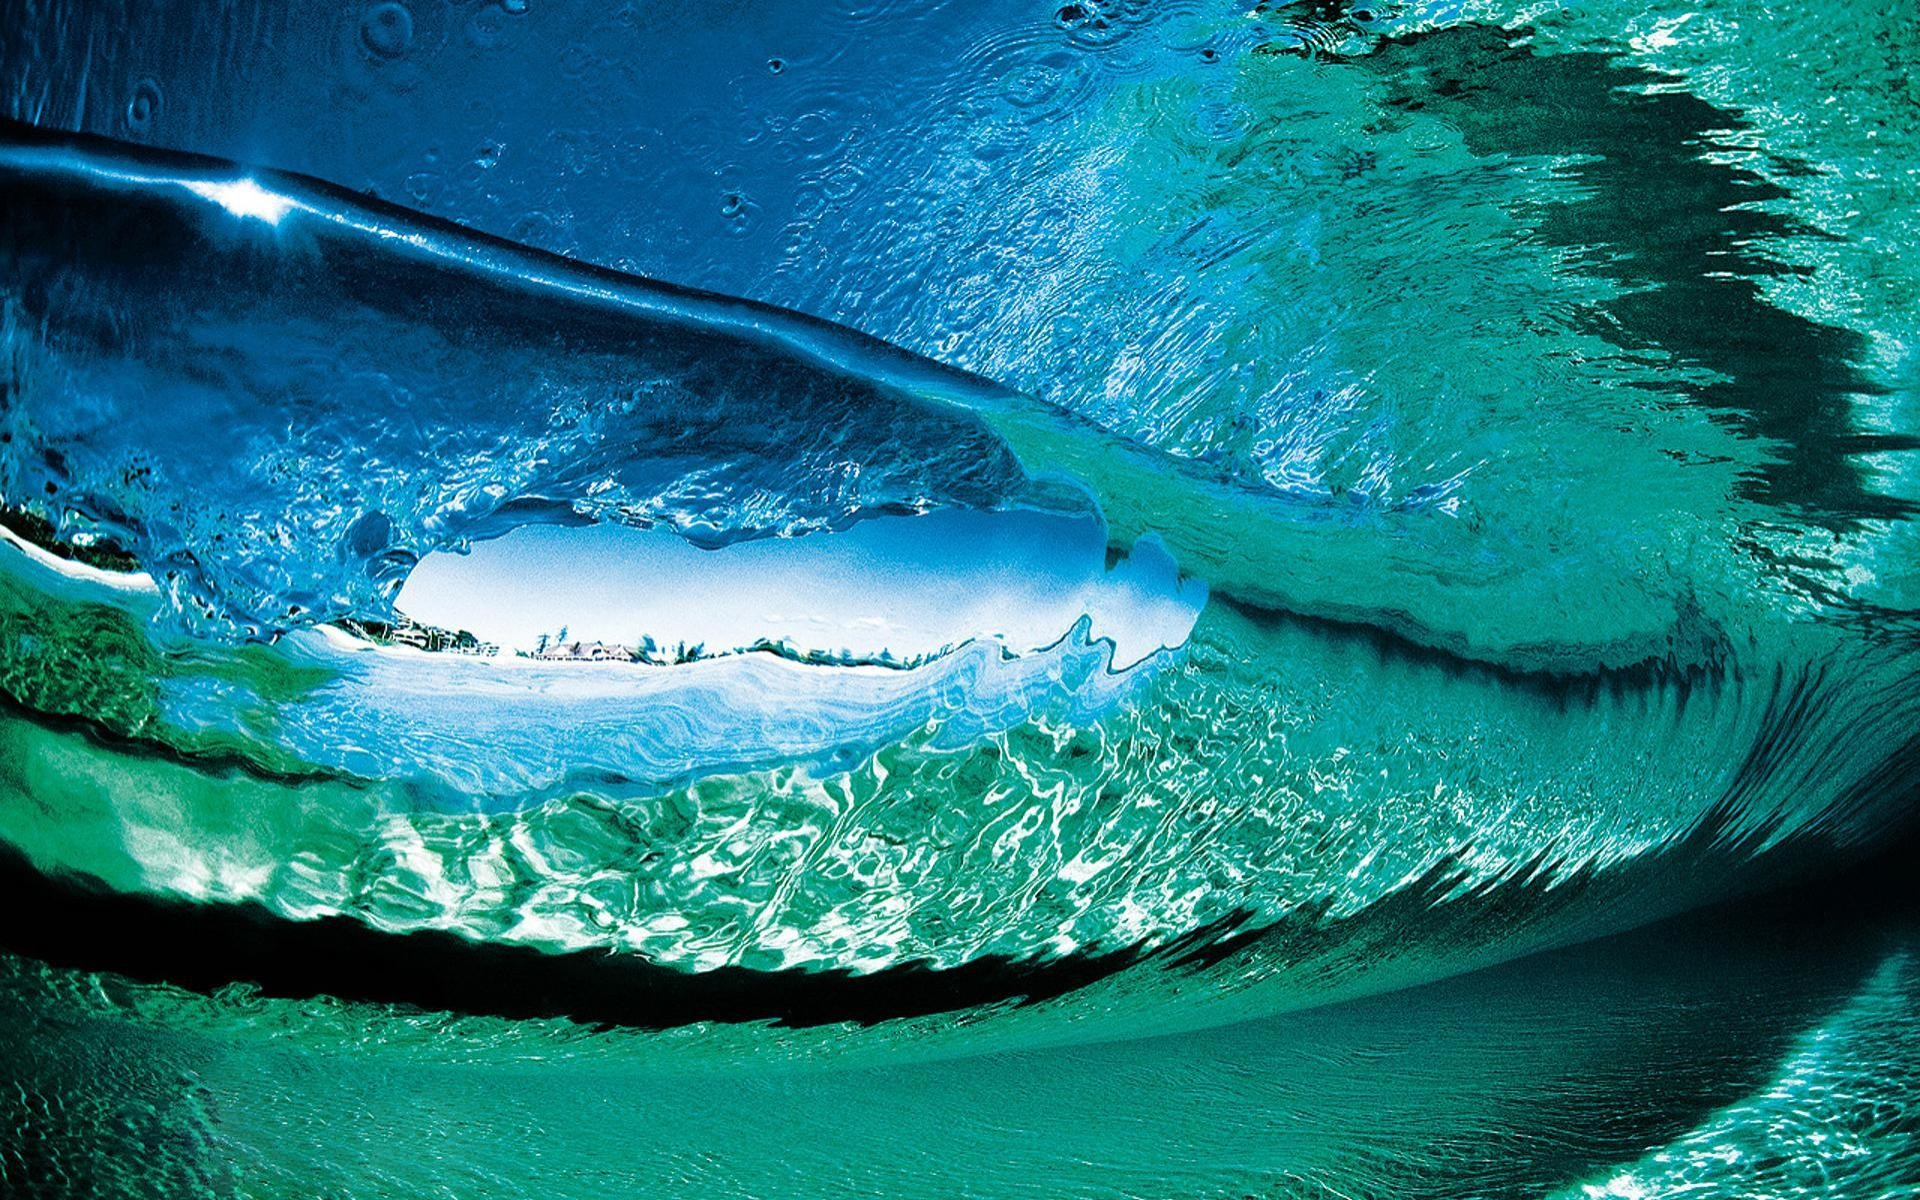 ocean-waves-hd-wallpaper-wallpaper-hd-ocean-download-